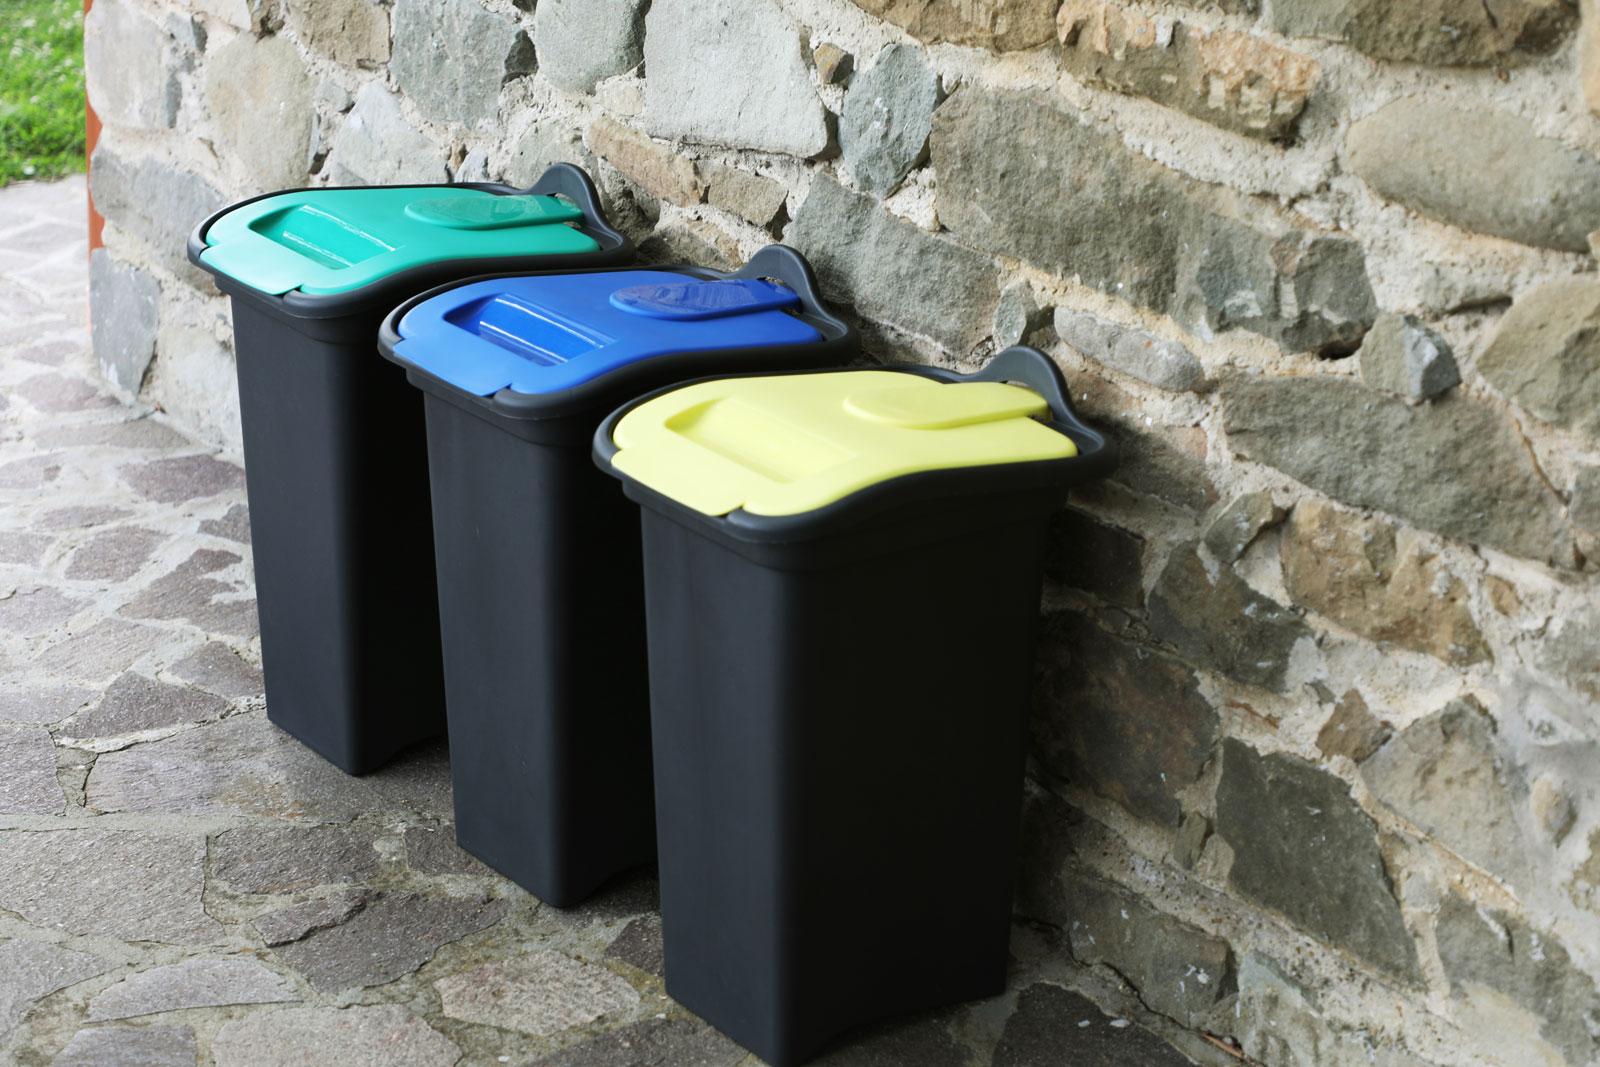 Casalinghi In Plastica Produzione.Utilplastic Produzione Casalinghi In Plastica Home